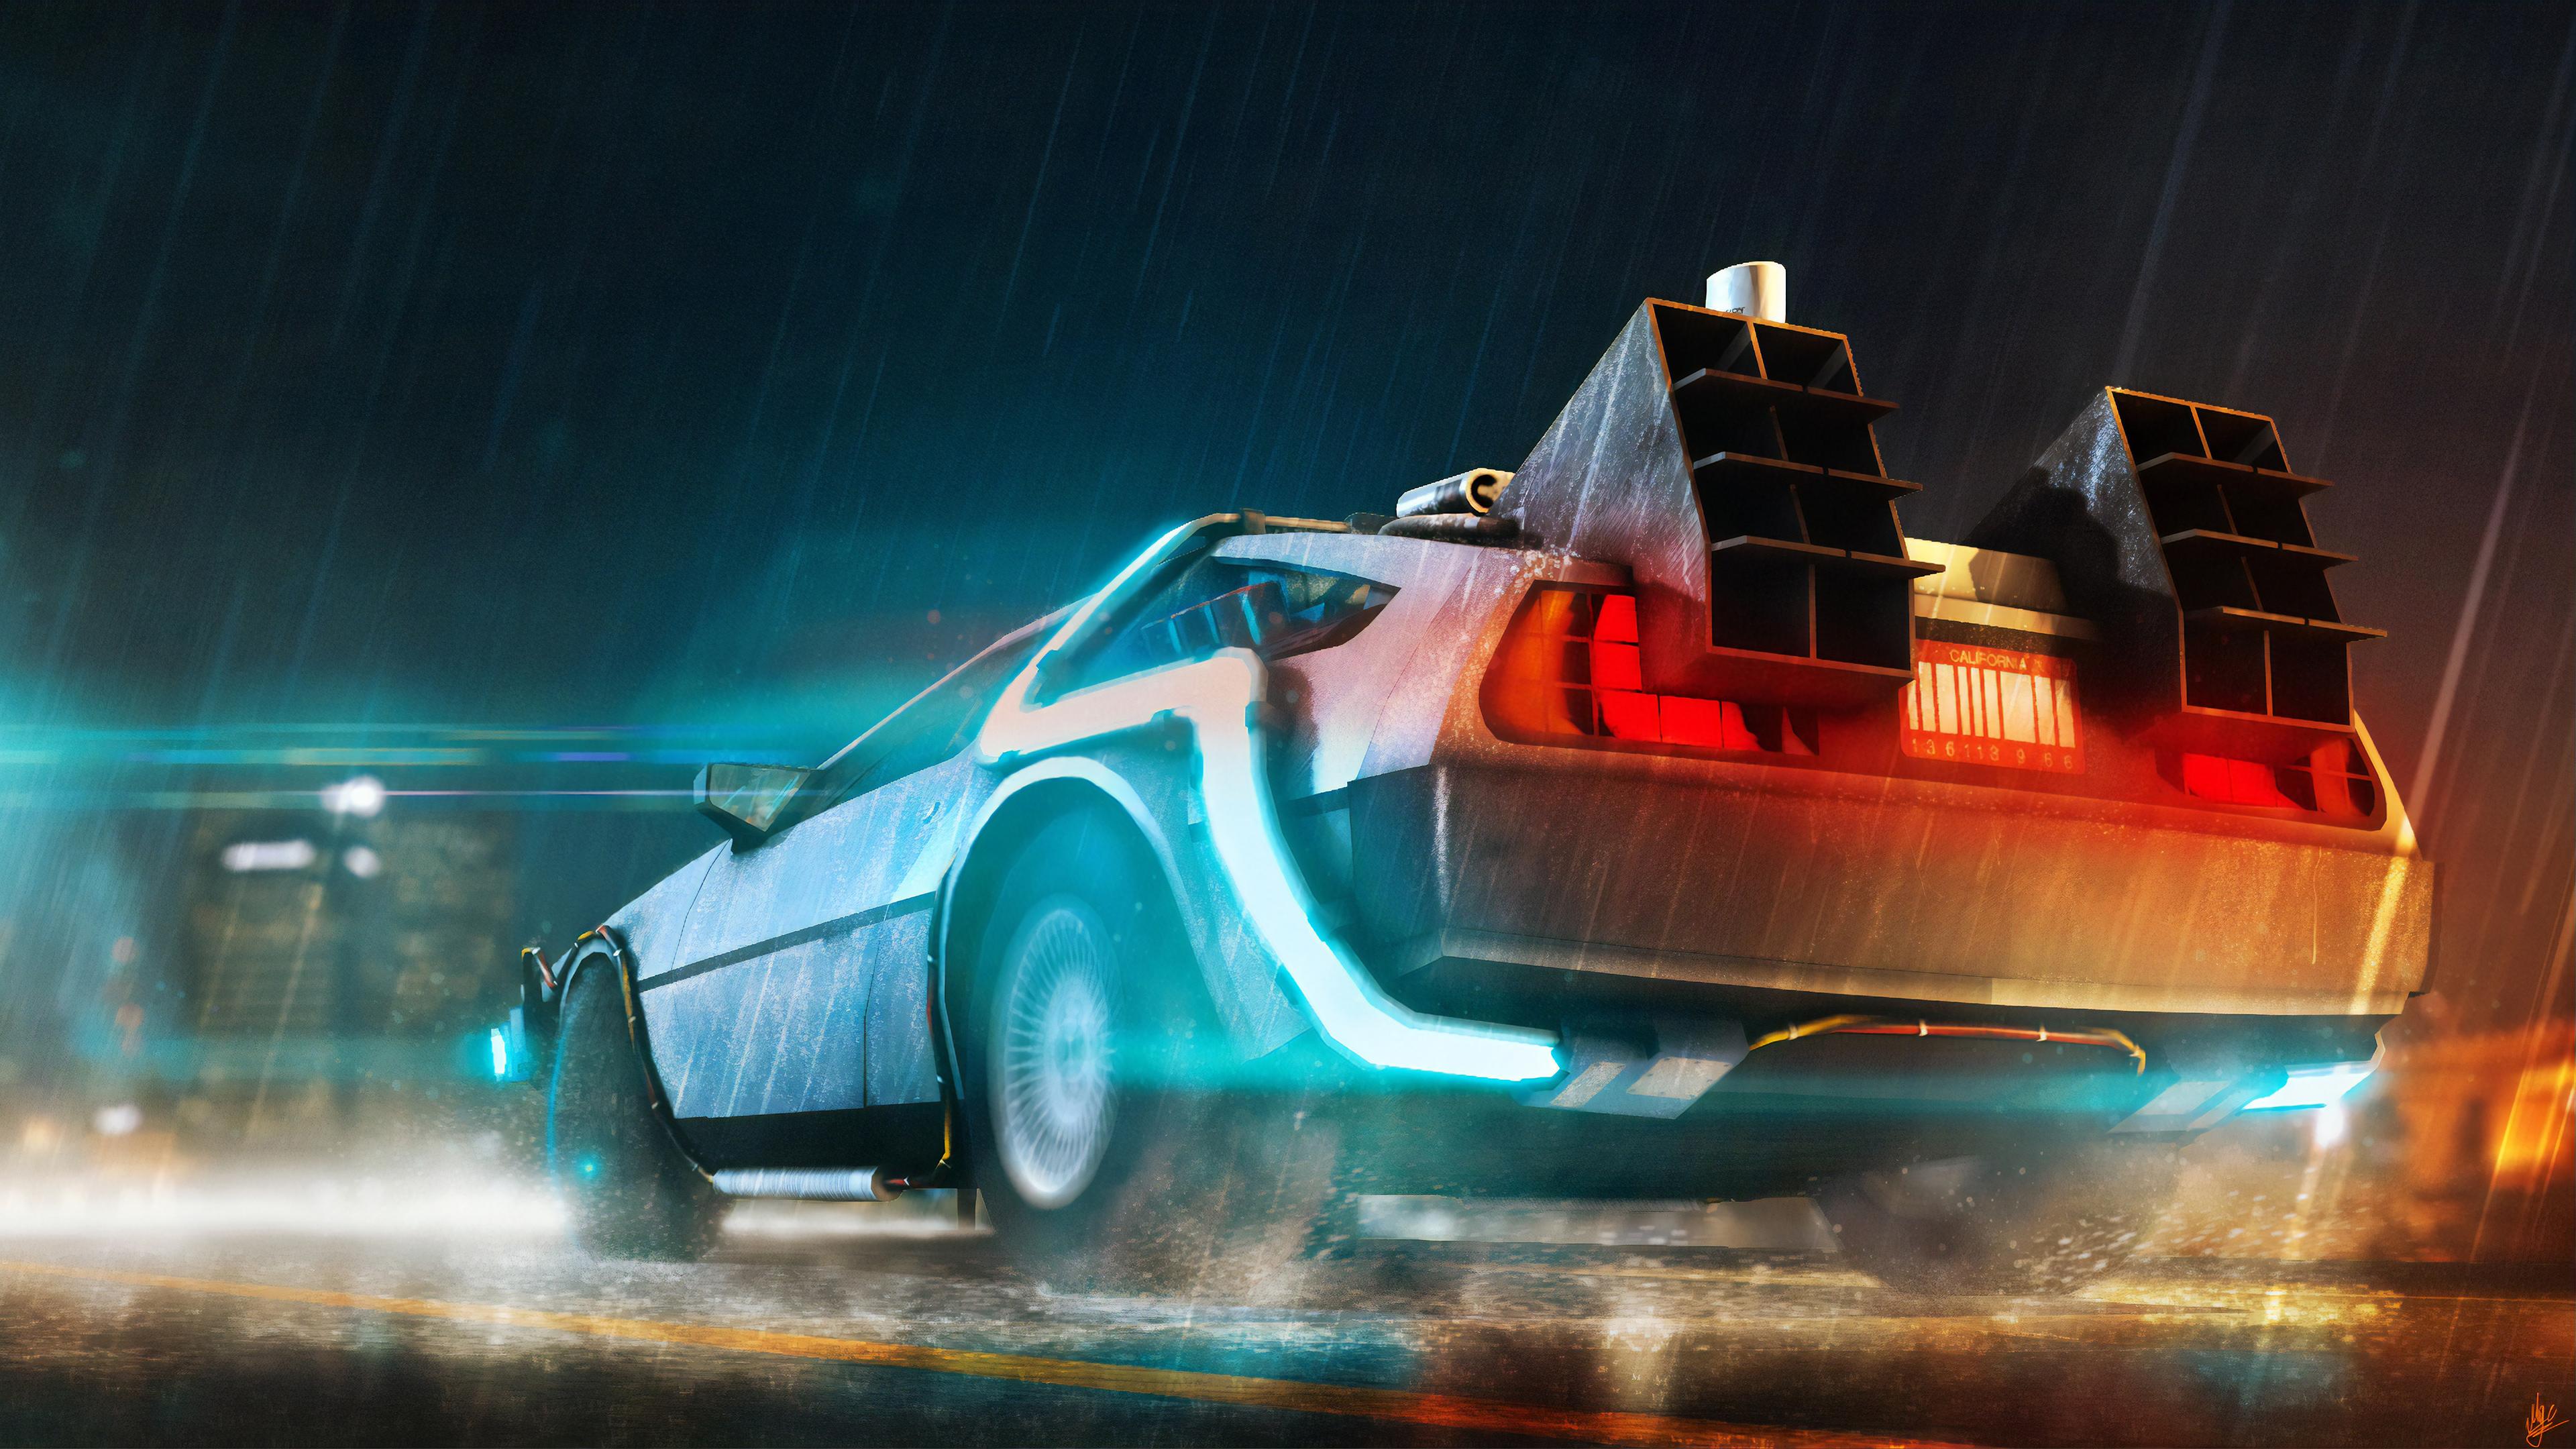 delorean cyberpunk car 4k 1559764630 - Delorean Cyberpunk Car 4k - hd-wallpapers, digital art wallpapers, cyberpunk wallpapers, cars wallpapers, artwork wallpapers, artist wallpapers, 4k-wallpapers